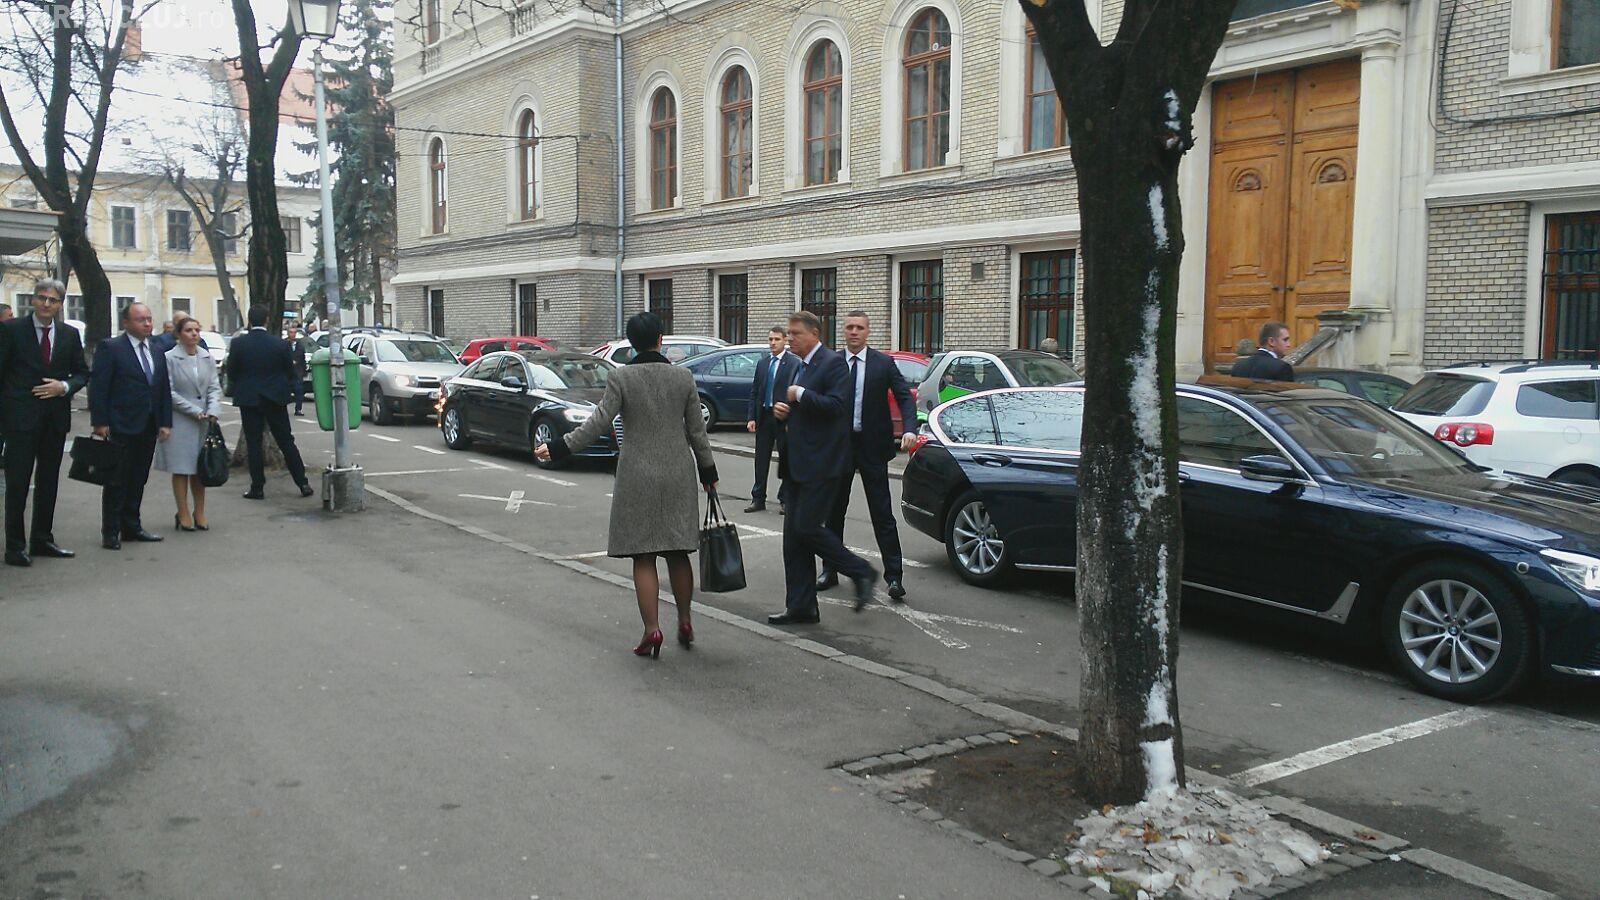 Klaus Iohannis a ajuns la UBB Cluj, pentru a participa la o dezbatere FOTO/VIDEO